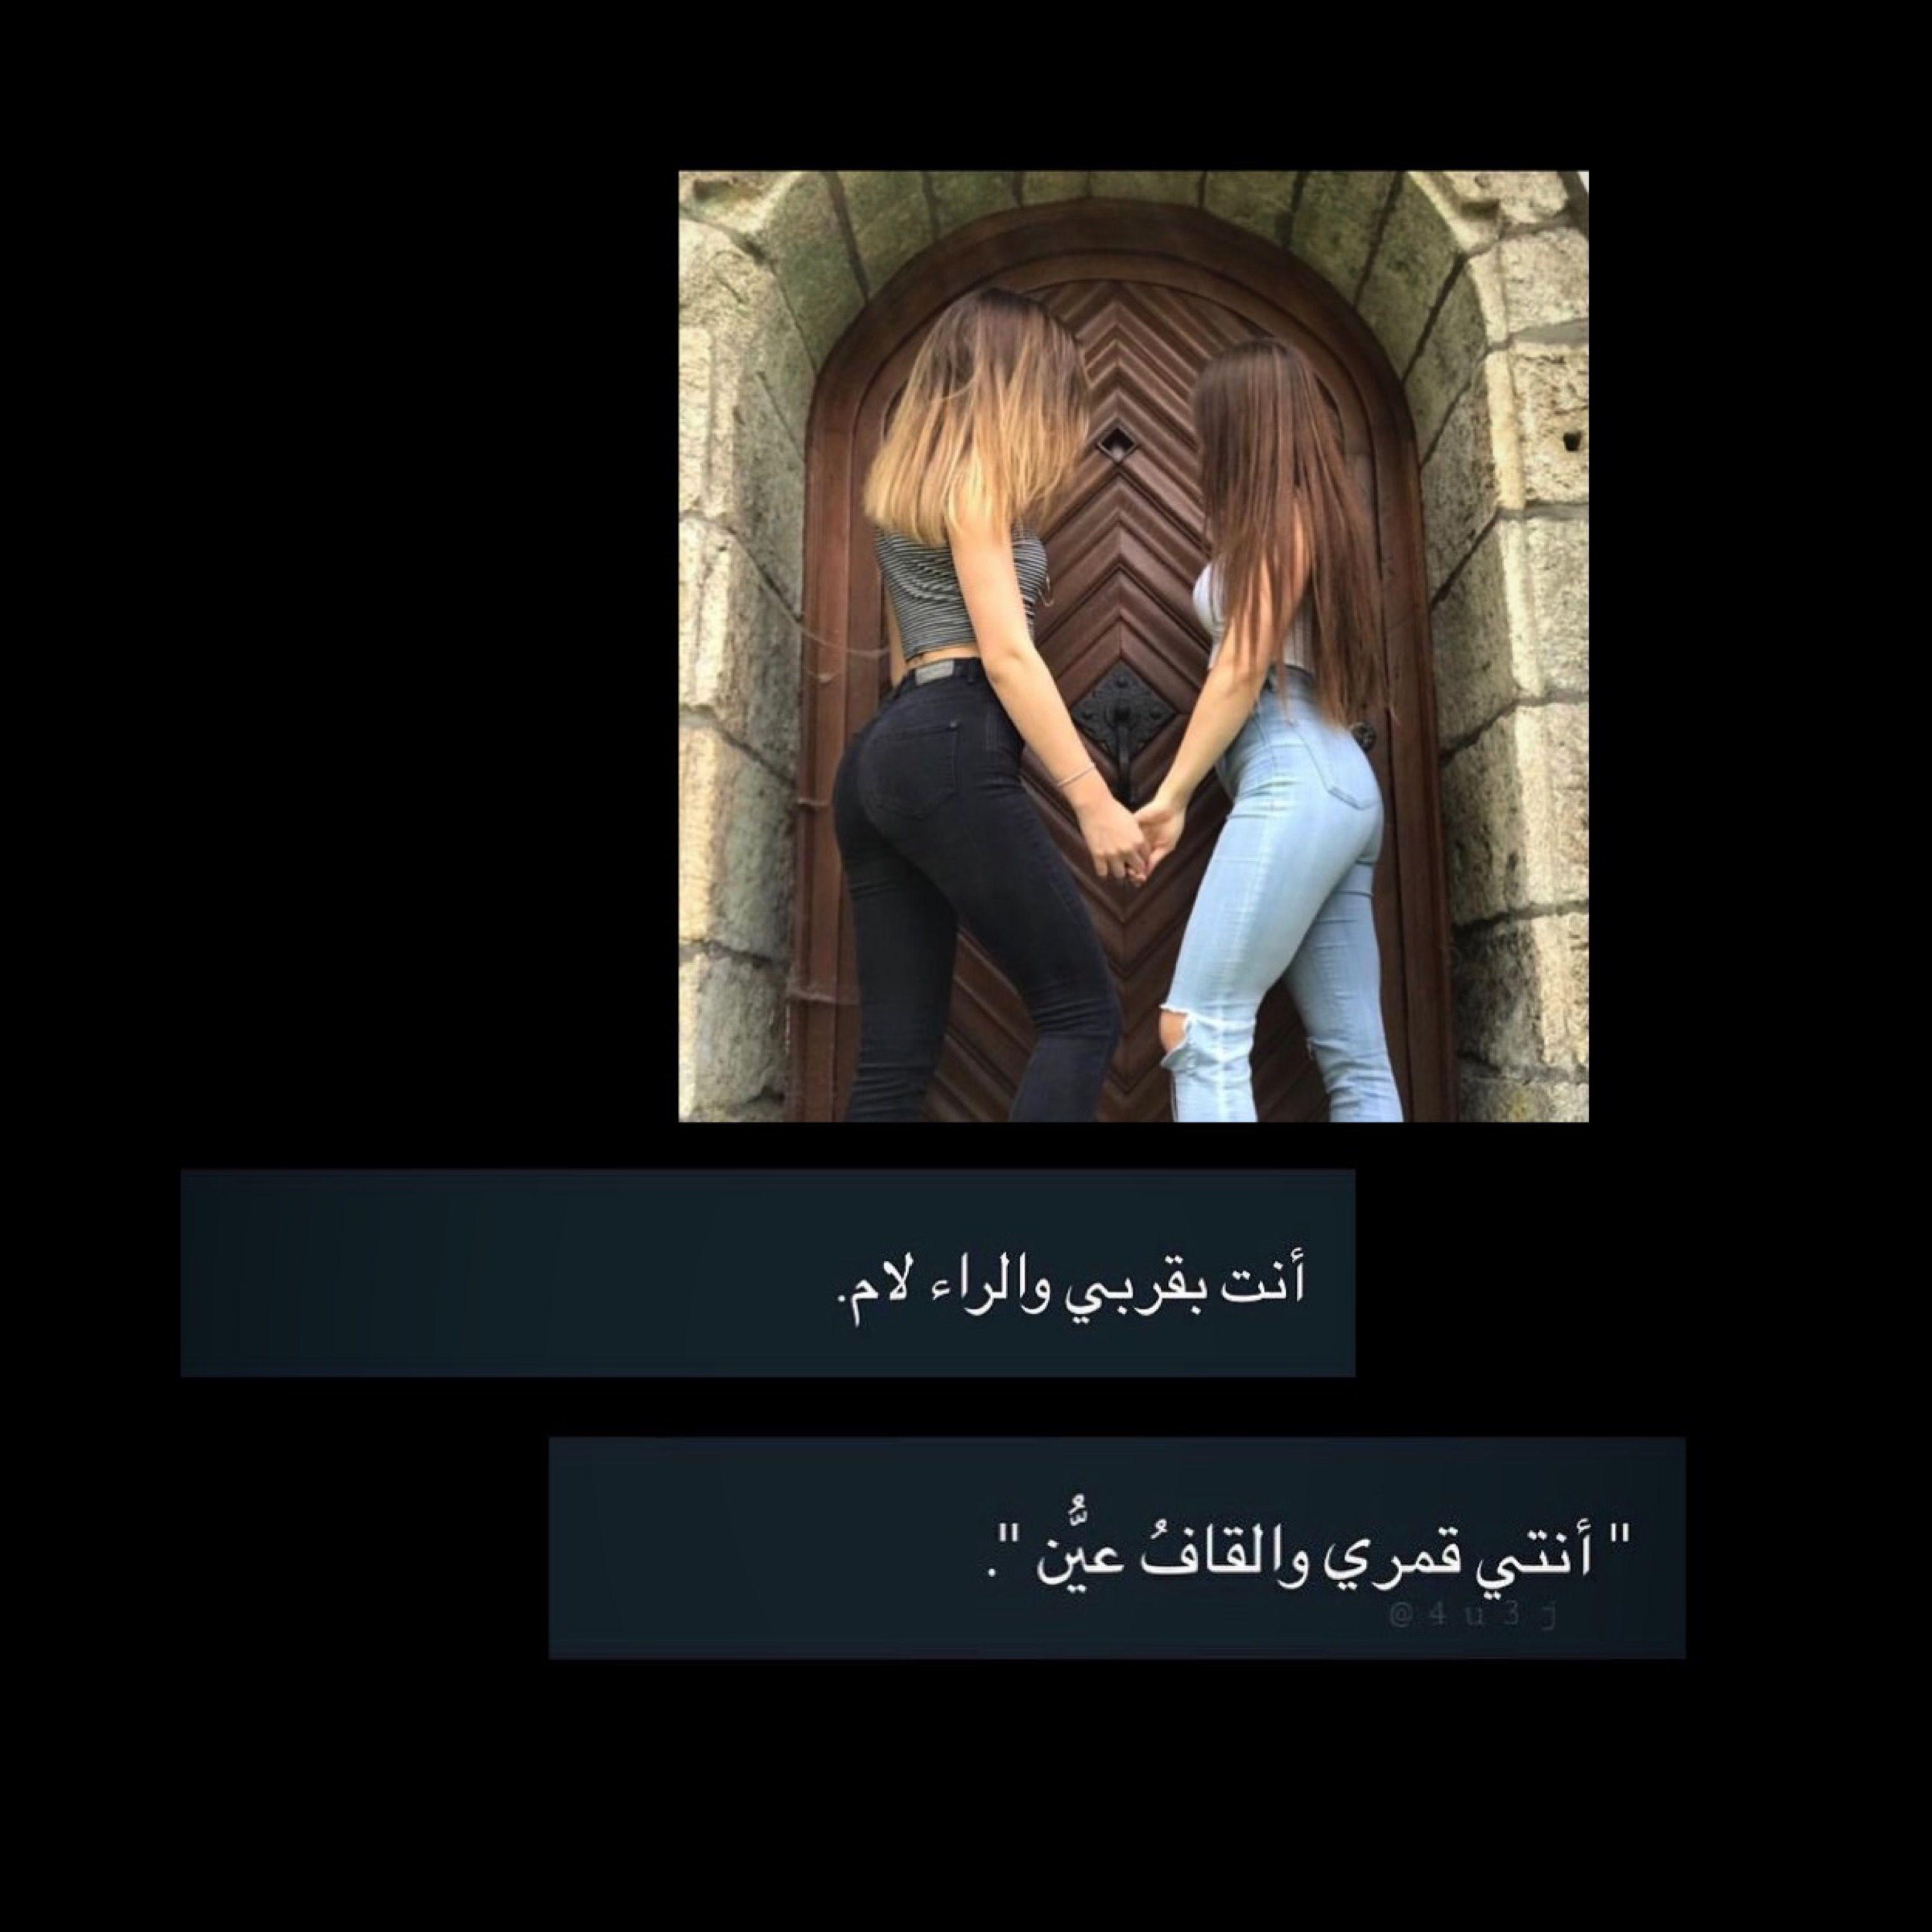 الى صديقتي Beautiful Arabic Words Funny Arabic Quotes Friends Quotes